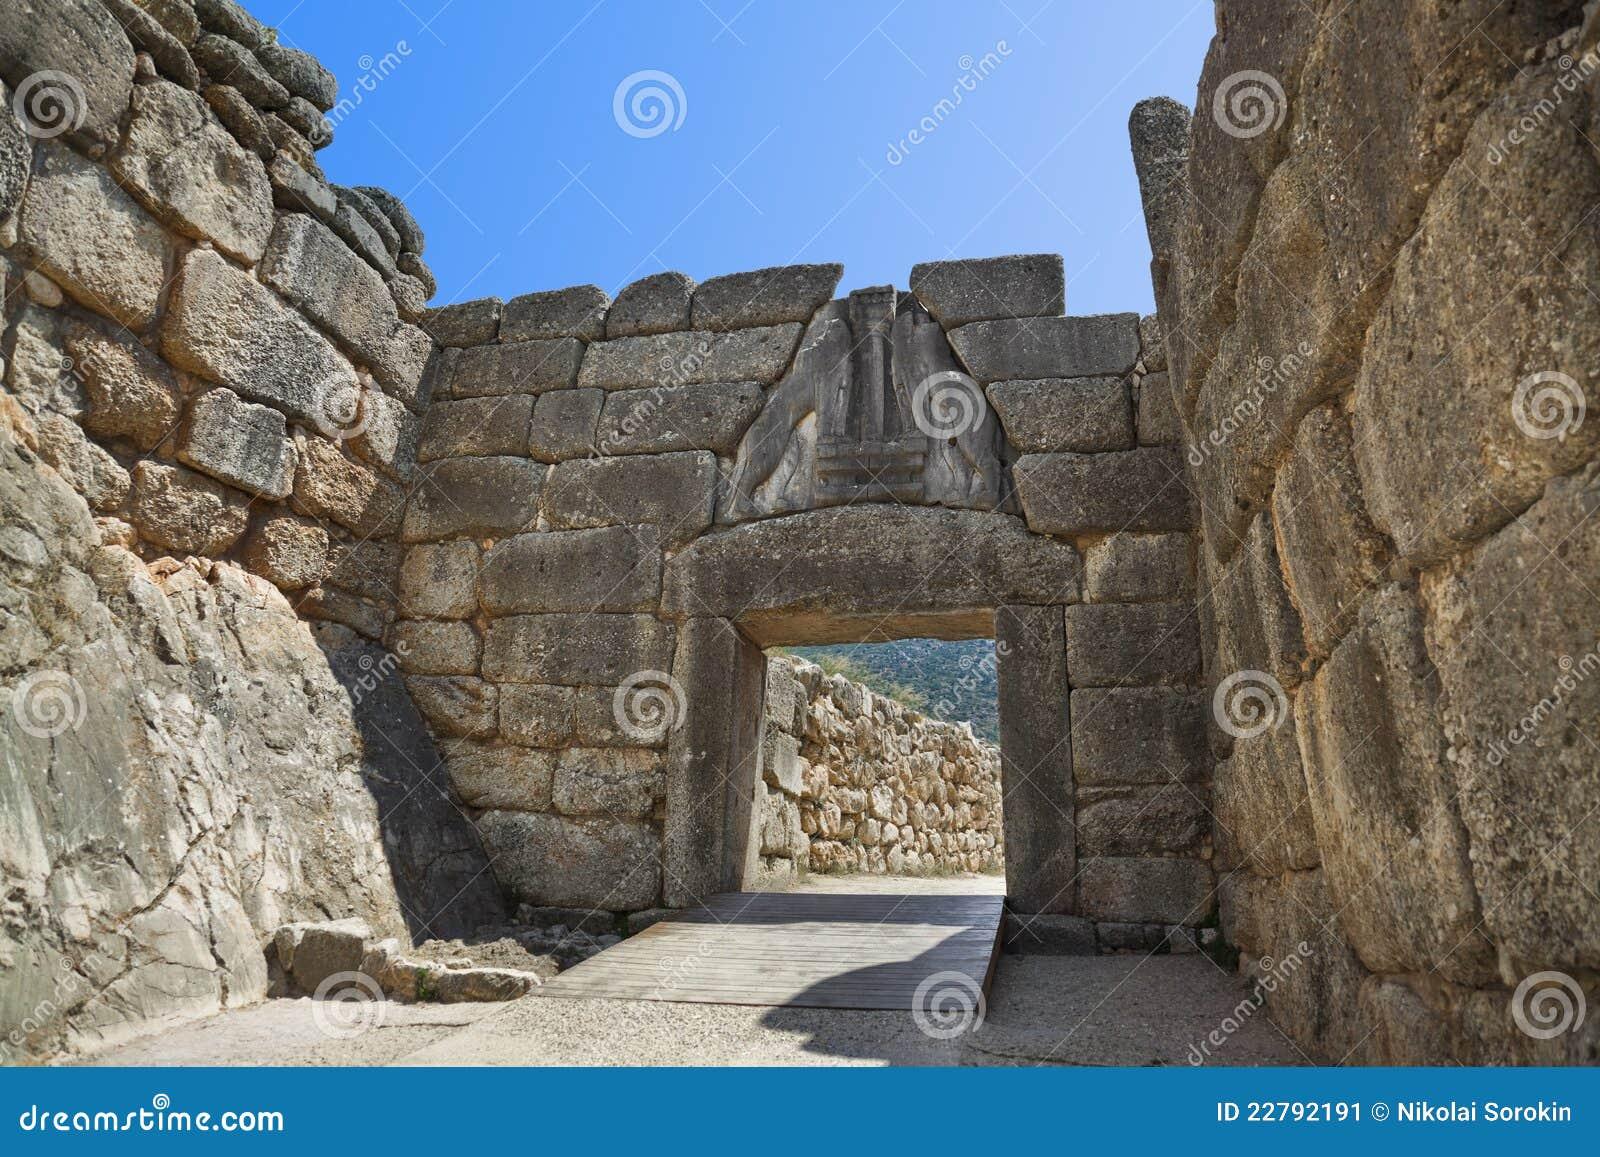 Löwe-Gatter bei Mycenae, Griechenland